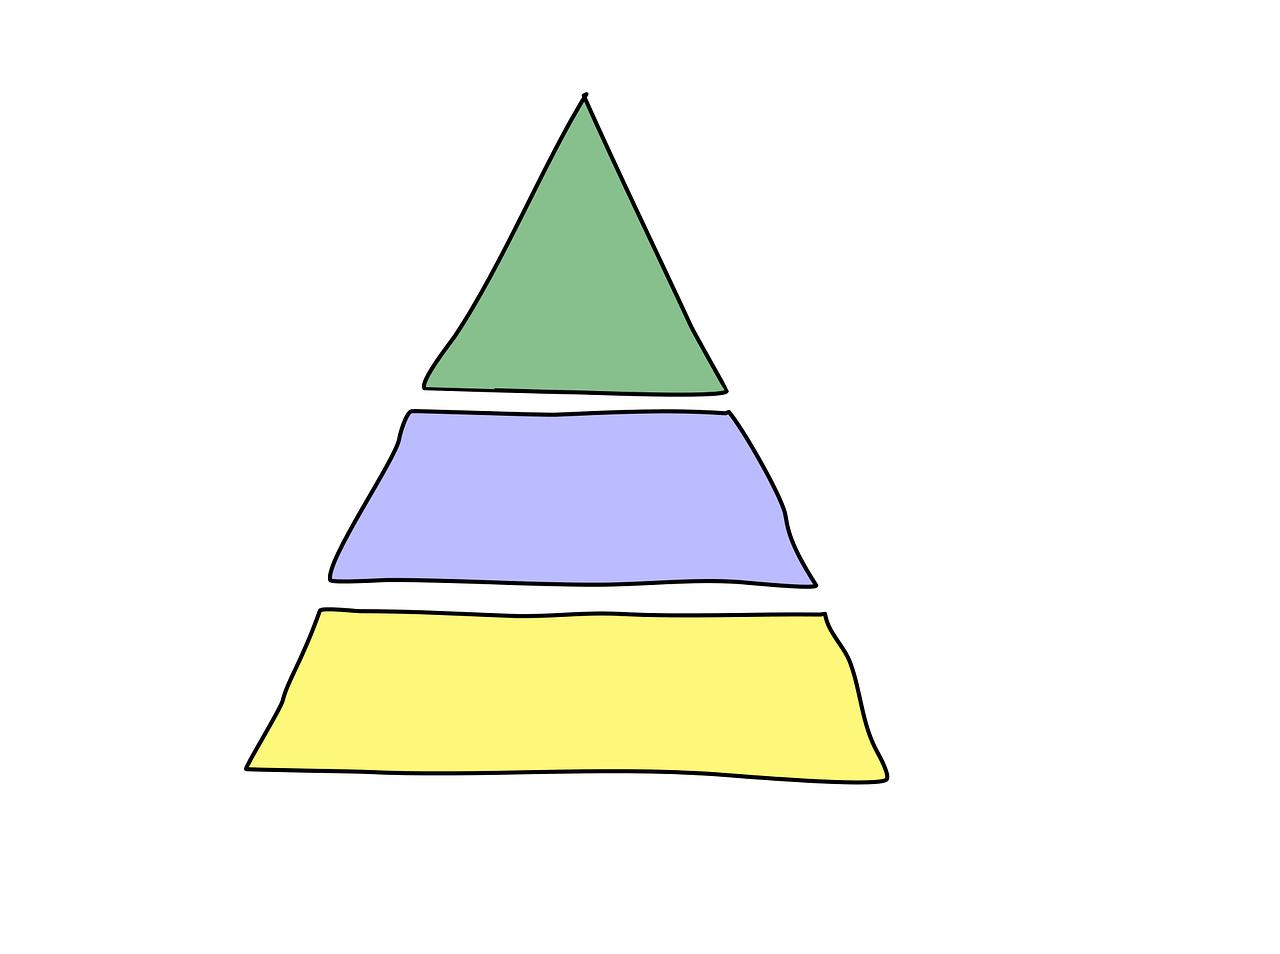 triangle-2108585_1280